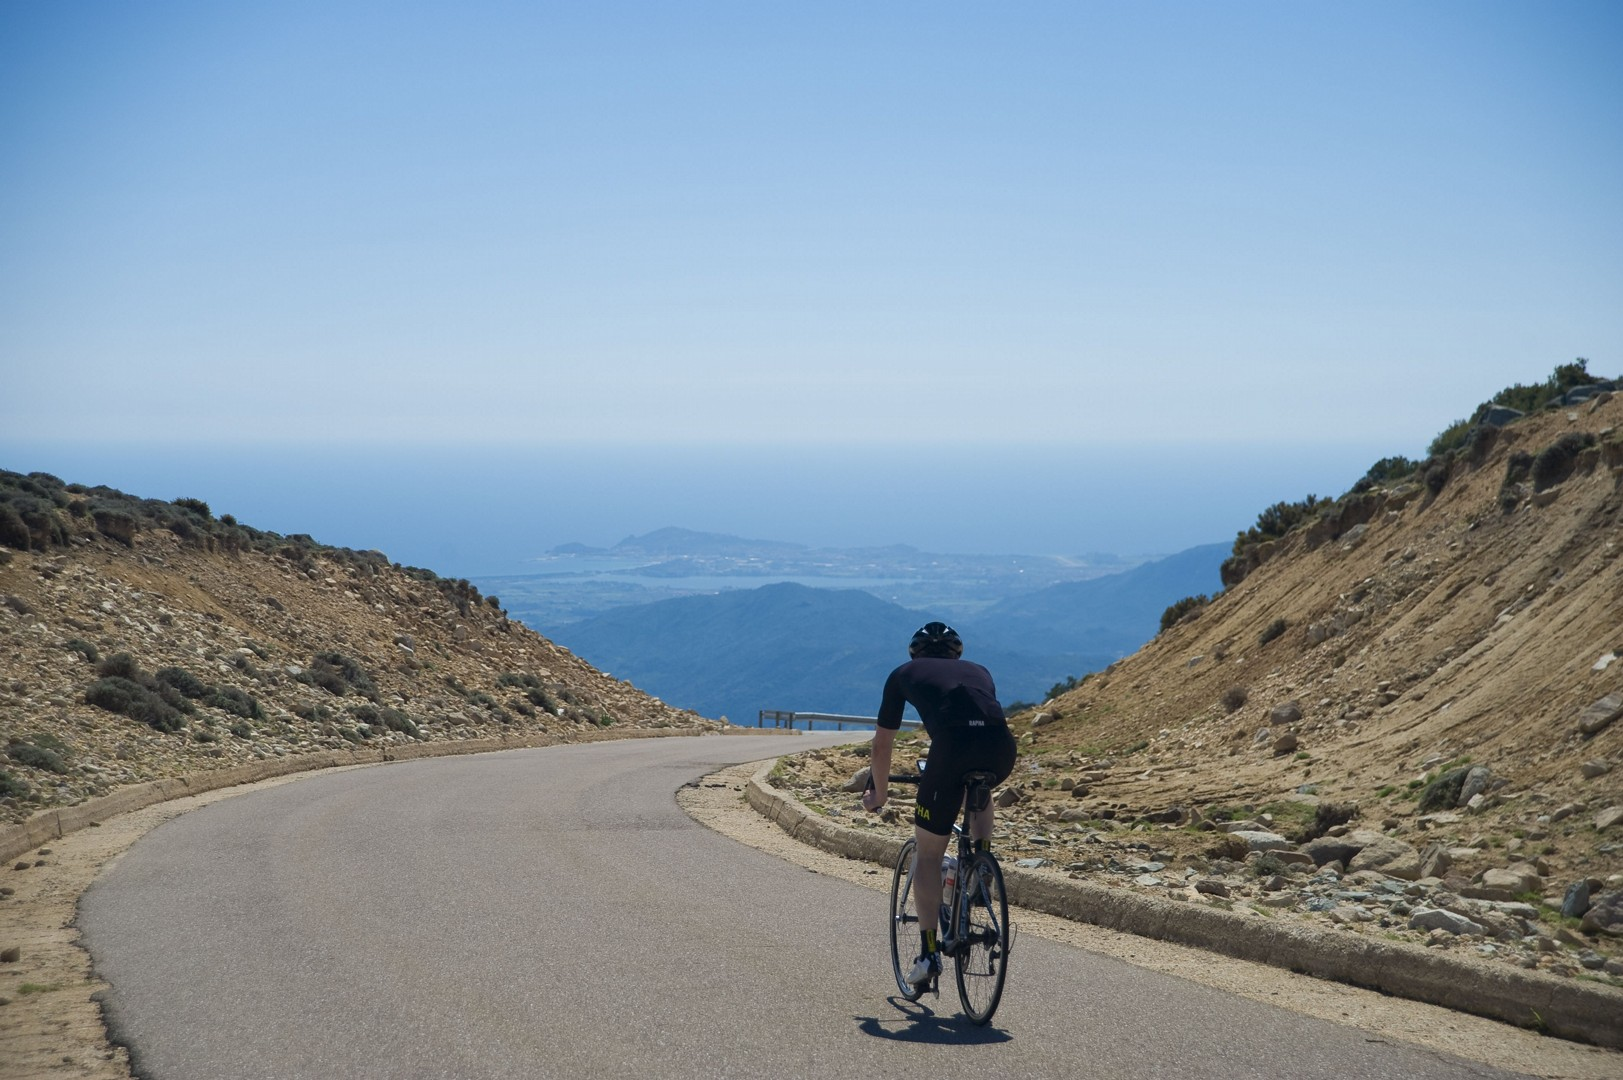 ESP2460.jpg - Italy - Sardinia - Mountain Explorer - Guided Road Cycling Holiday - Italia Road Cycling